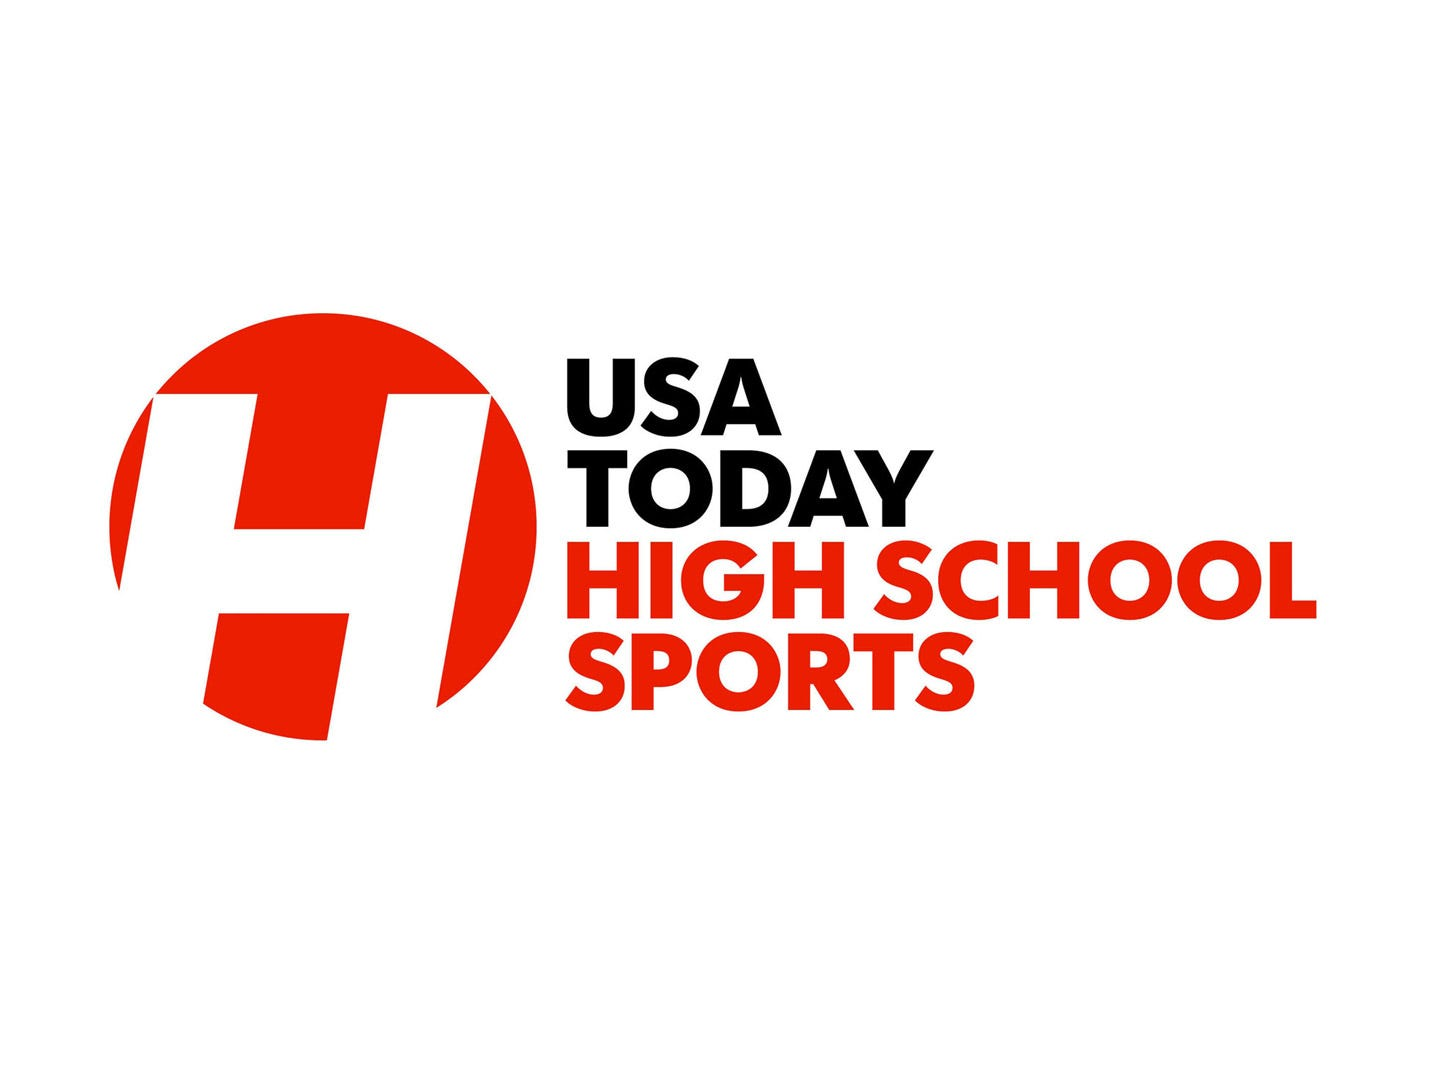 USA Today High School Sports